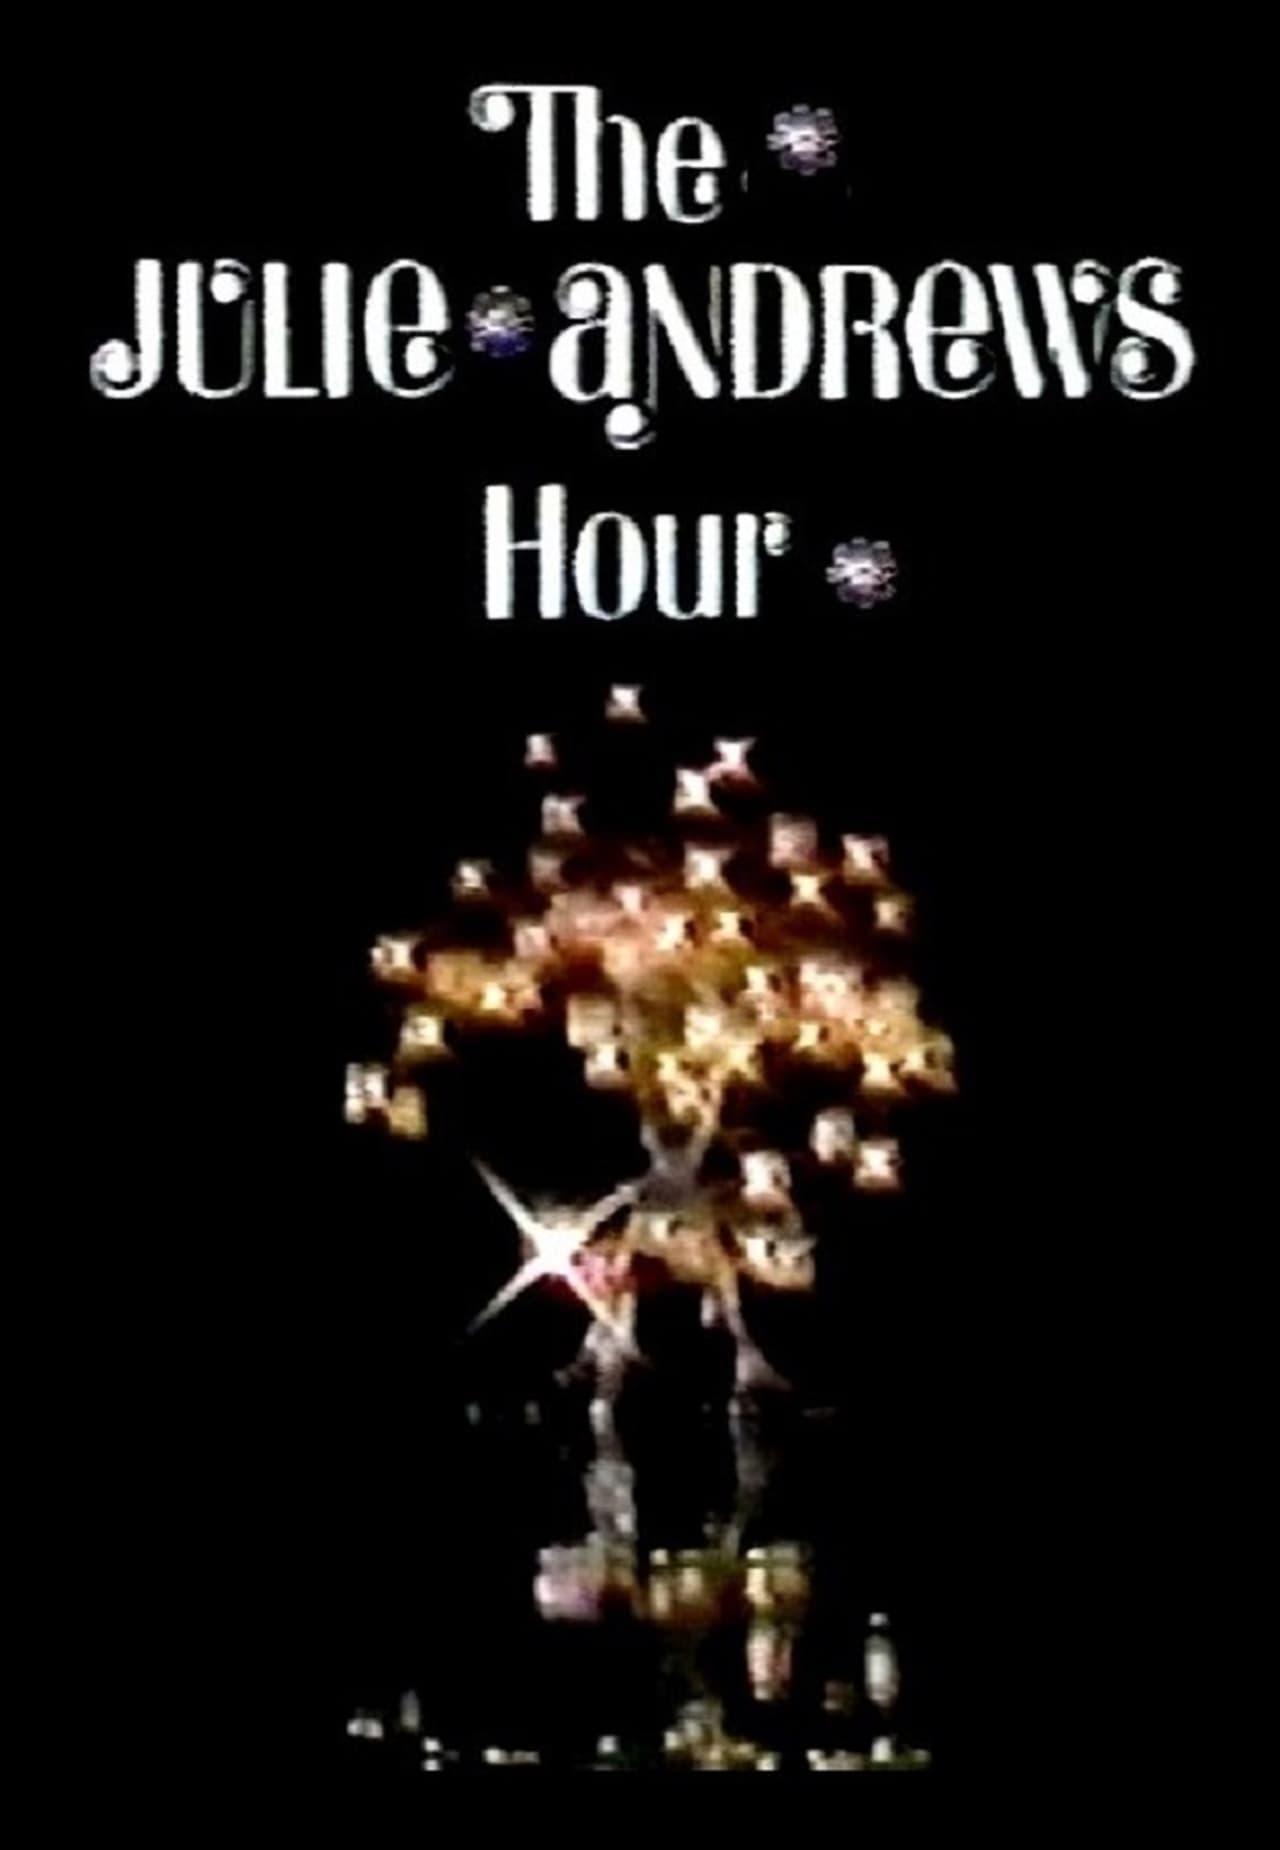 The Julie Andrews Hour